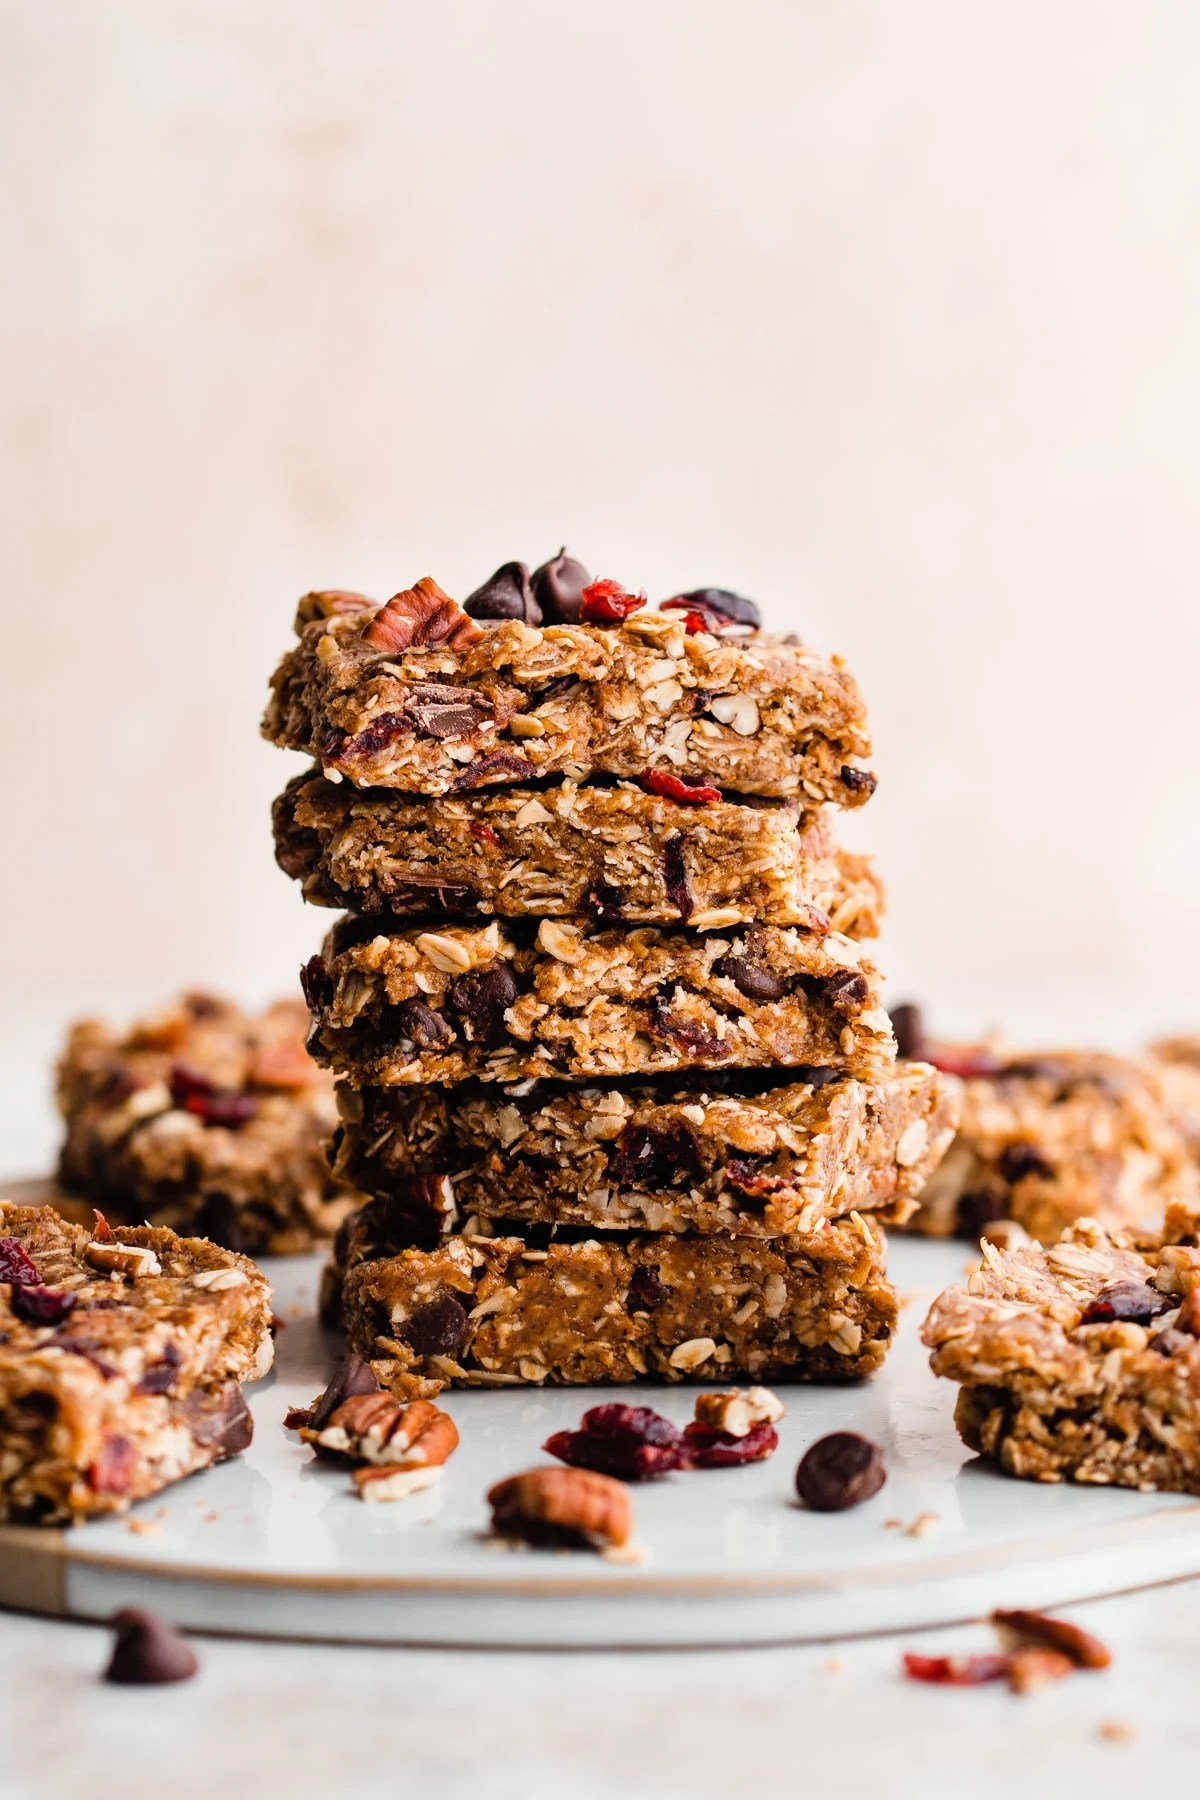 Healthy Salted Chocolate Almond No Bake Granola Bars